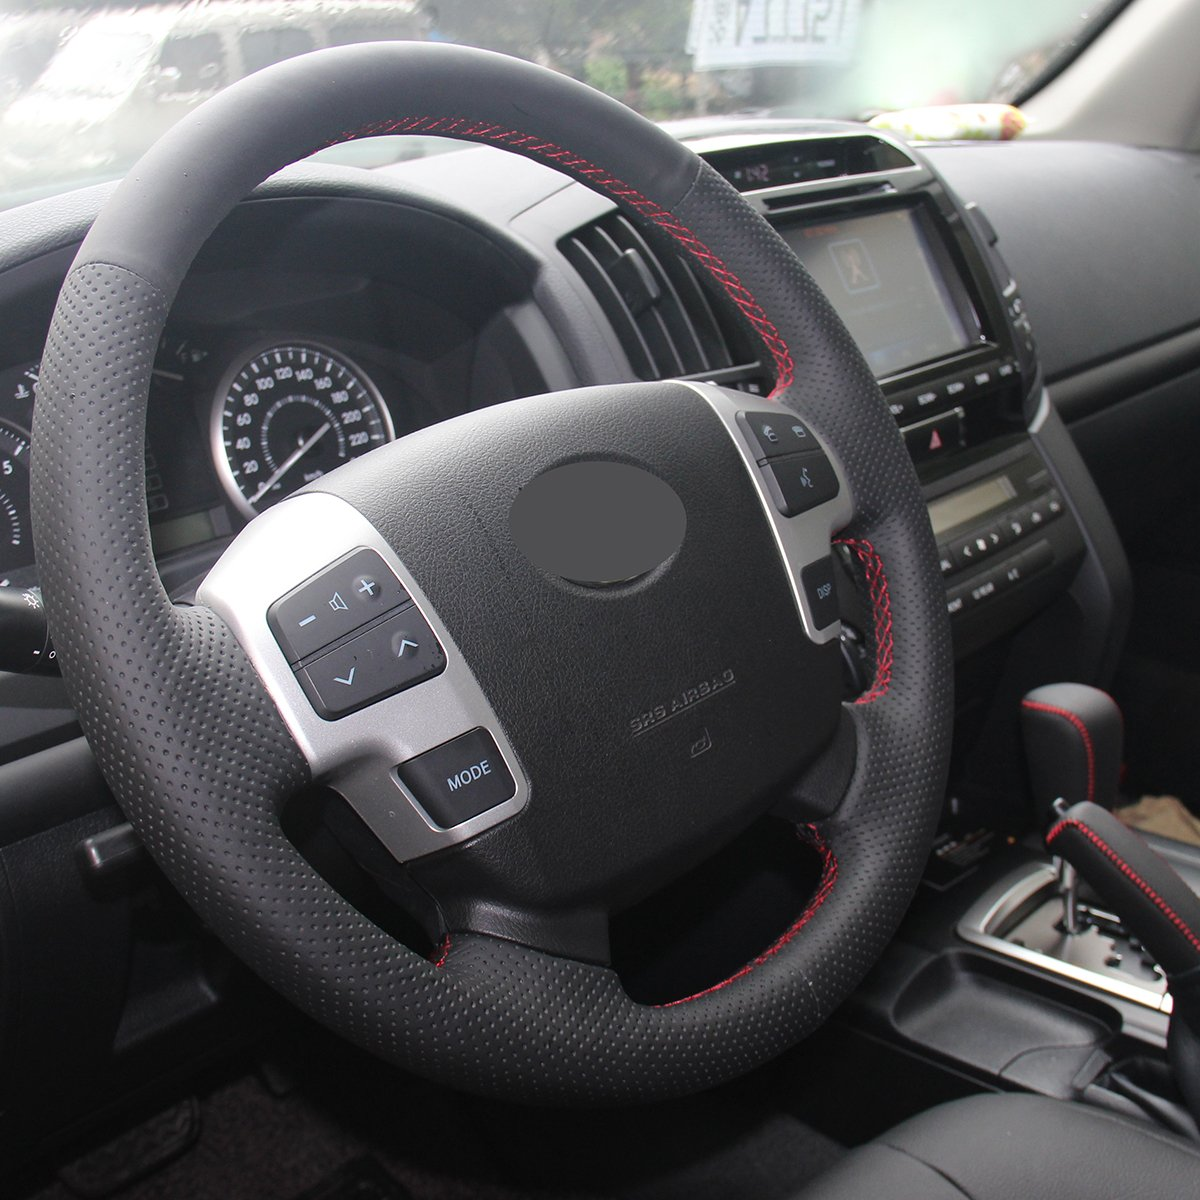 JI Loncky Black Genuine Leather Auto Custom Steering Wheel Covers for 2008-2015 Toyota Land Cruiser 2008-2013 Toyota Sequoia Accessories lfy-0056 2007 2008 2009 2010 2011 2012 2013 Toyota Tundra